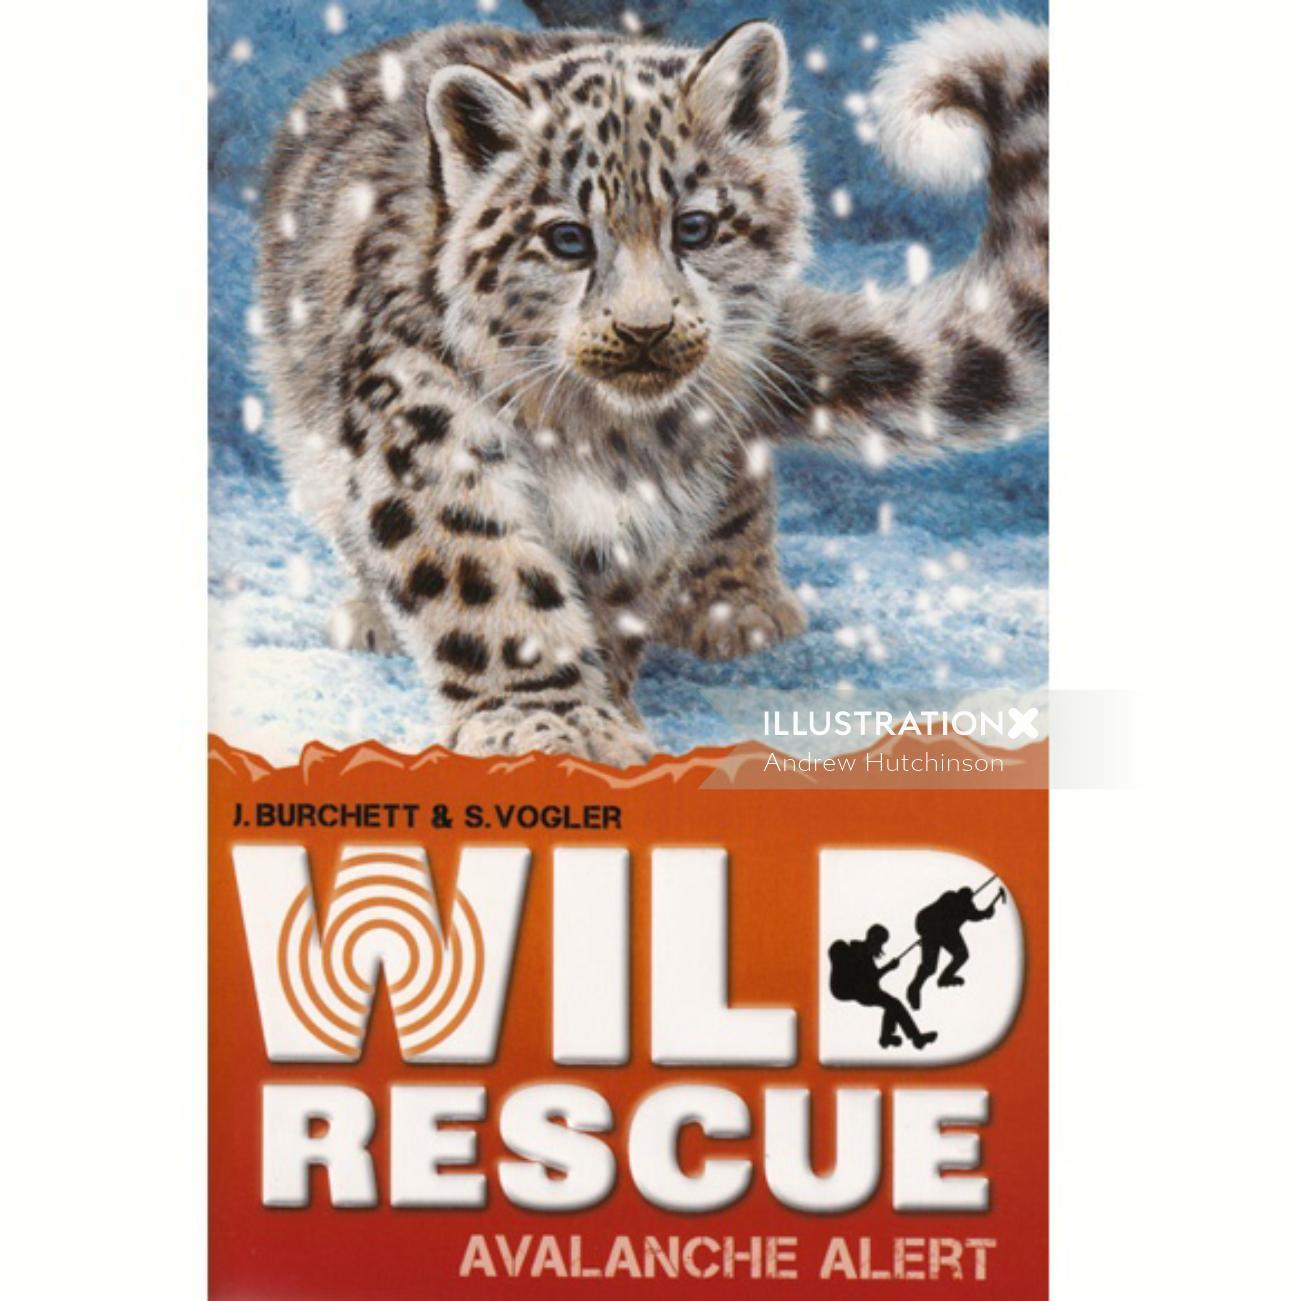 Snow Leopard Illustration, Wildlife Images © Andrew Hutchinson